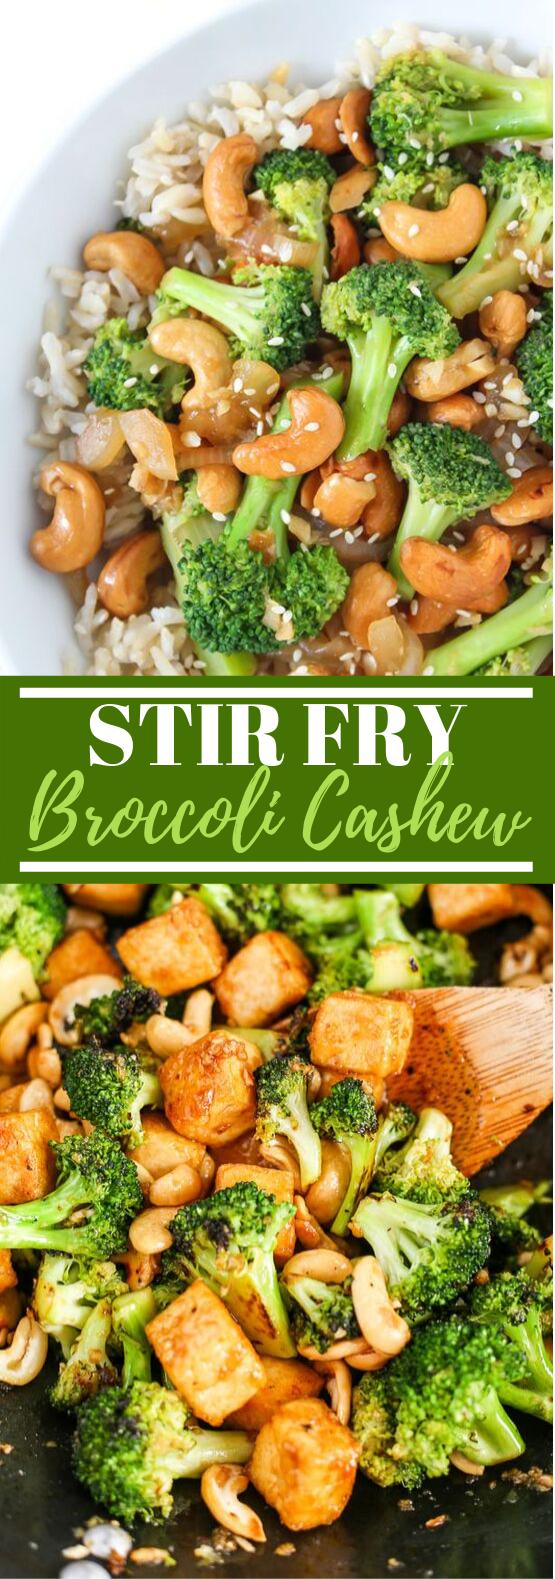 Broccoli Cashew Stir-Fry #vegetarian #vegan